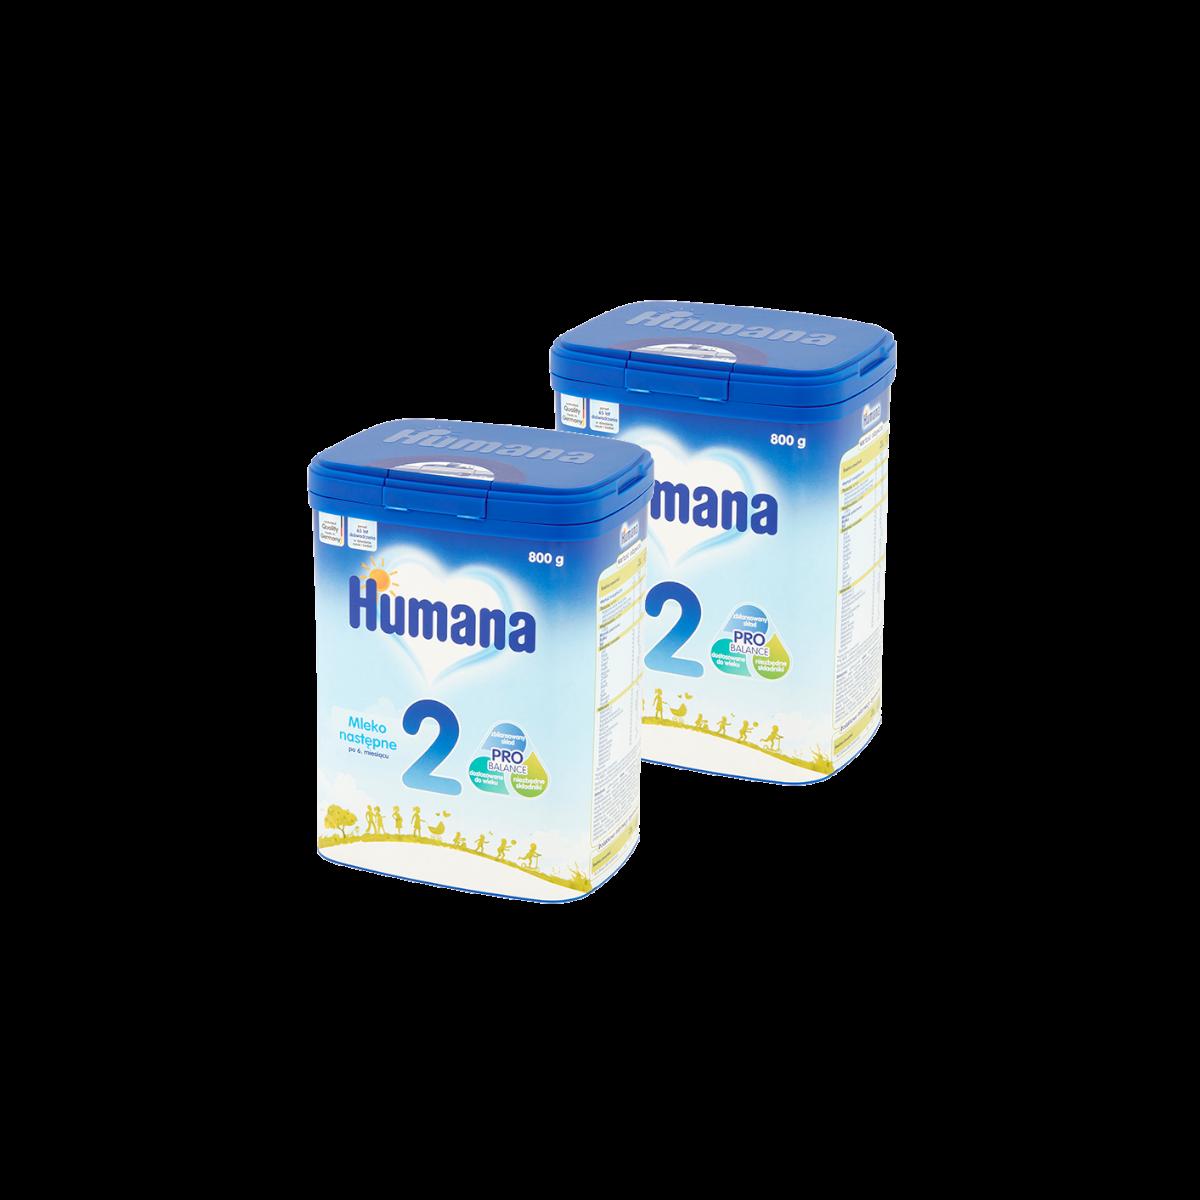 humana2_800_2pak